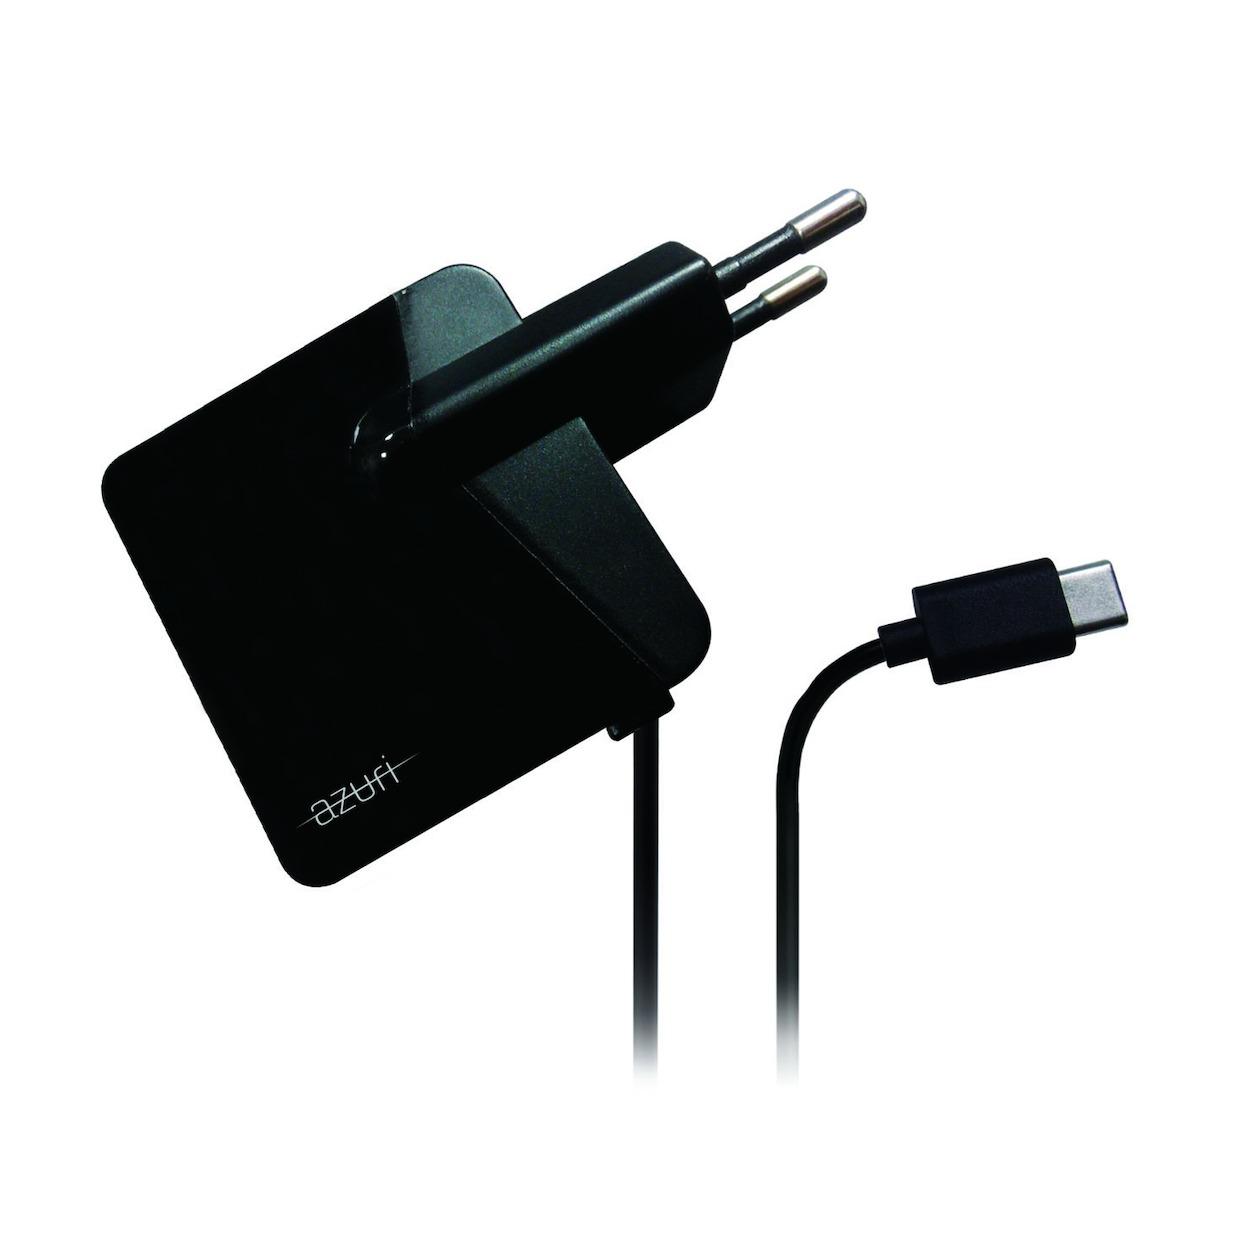 Azuri thuislader USB type C fix cable 2.4amp 1.2m